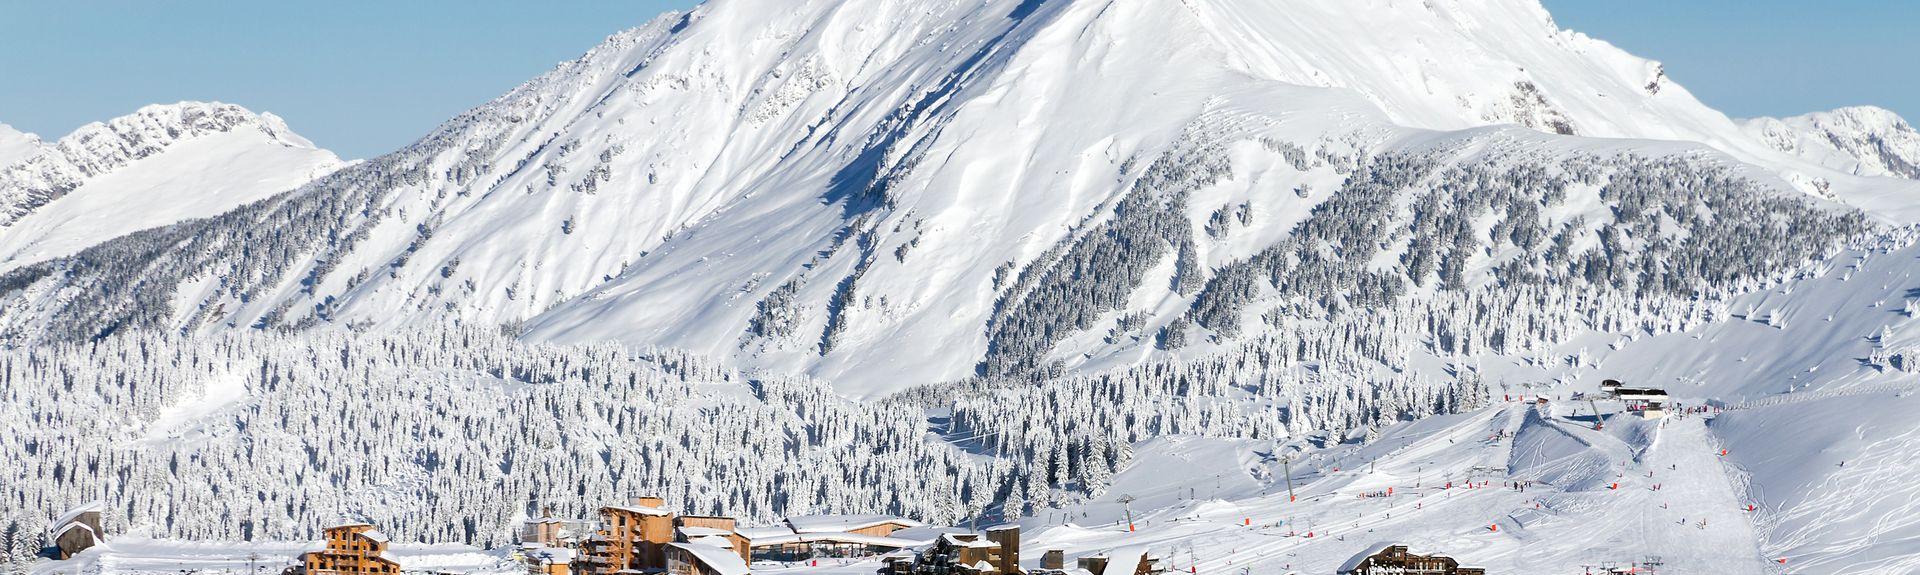 Avoriaz, Morzine, Haute-Savoie (departementti), Ranska